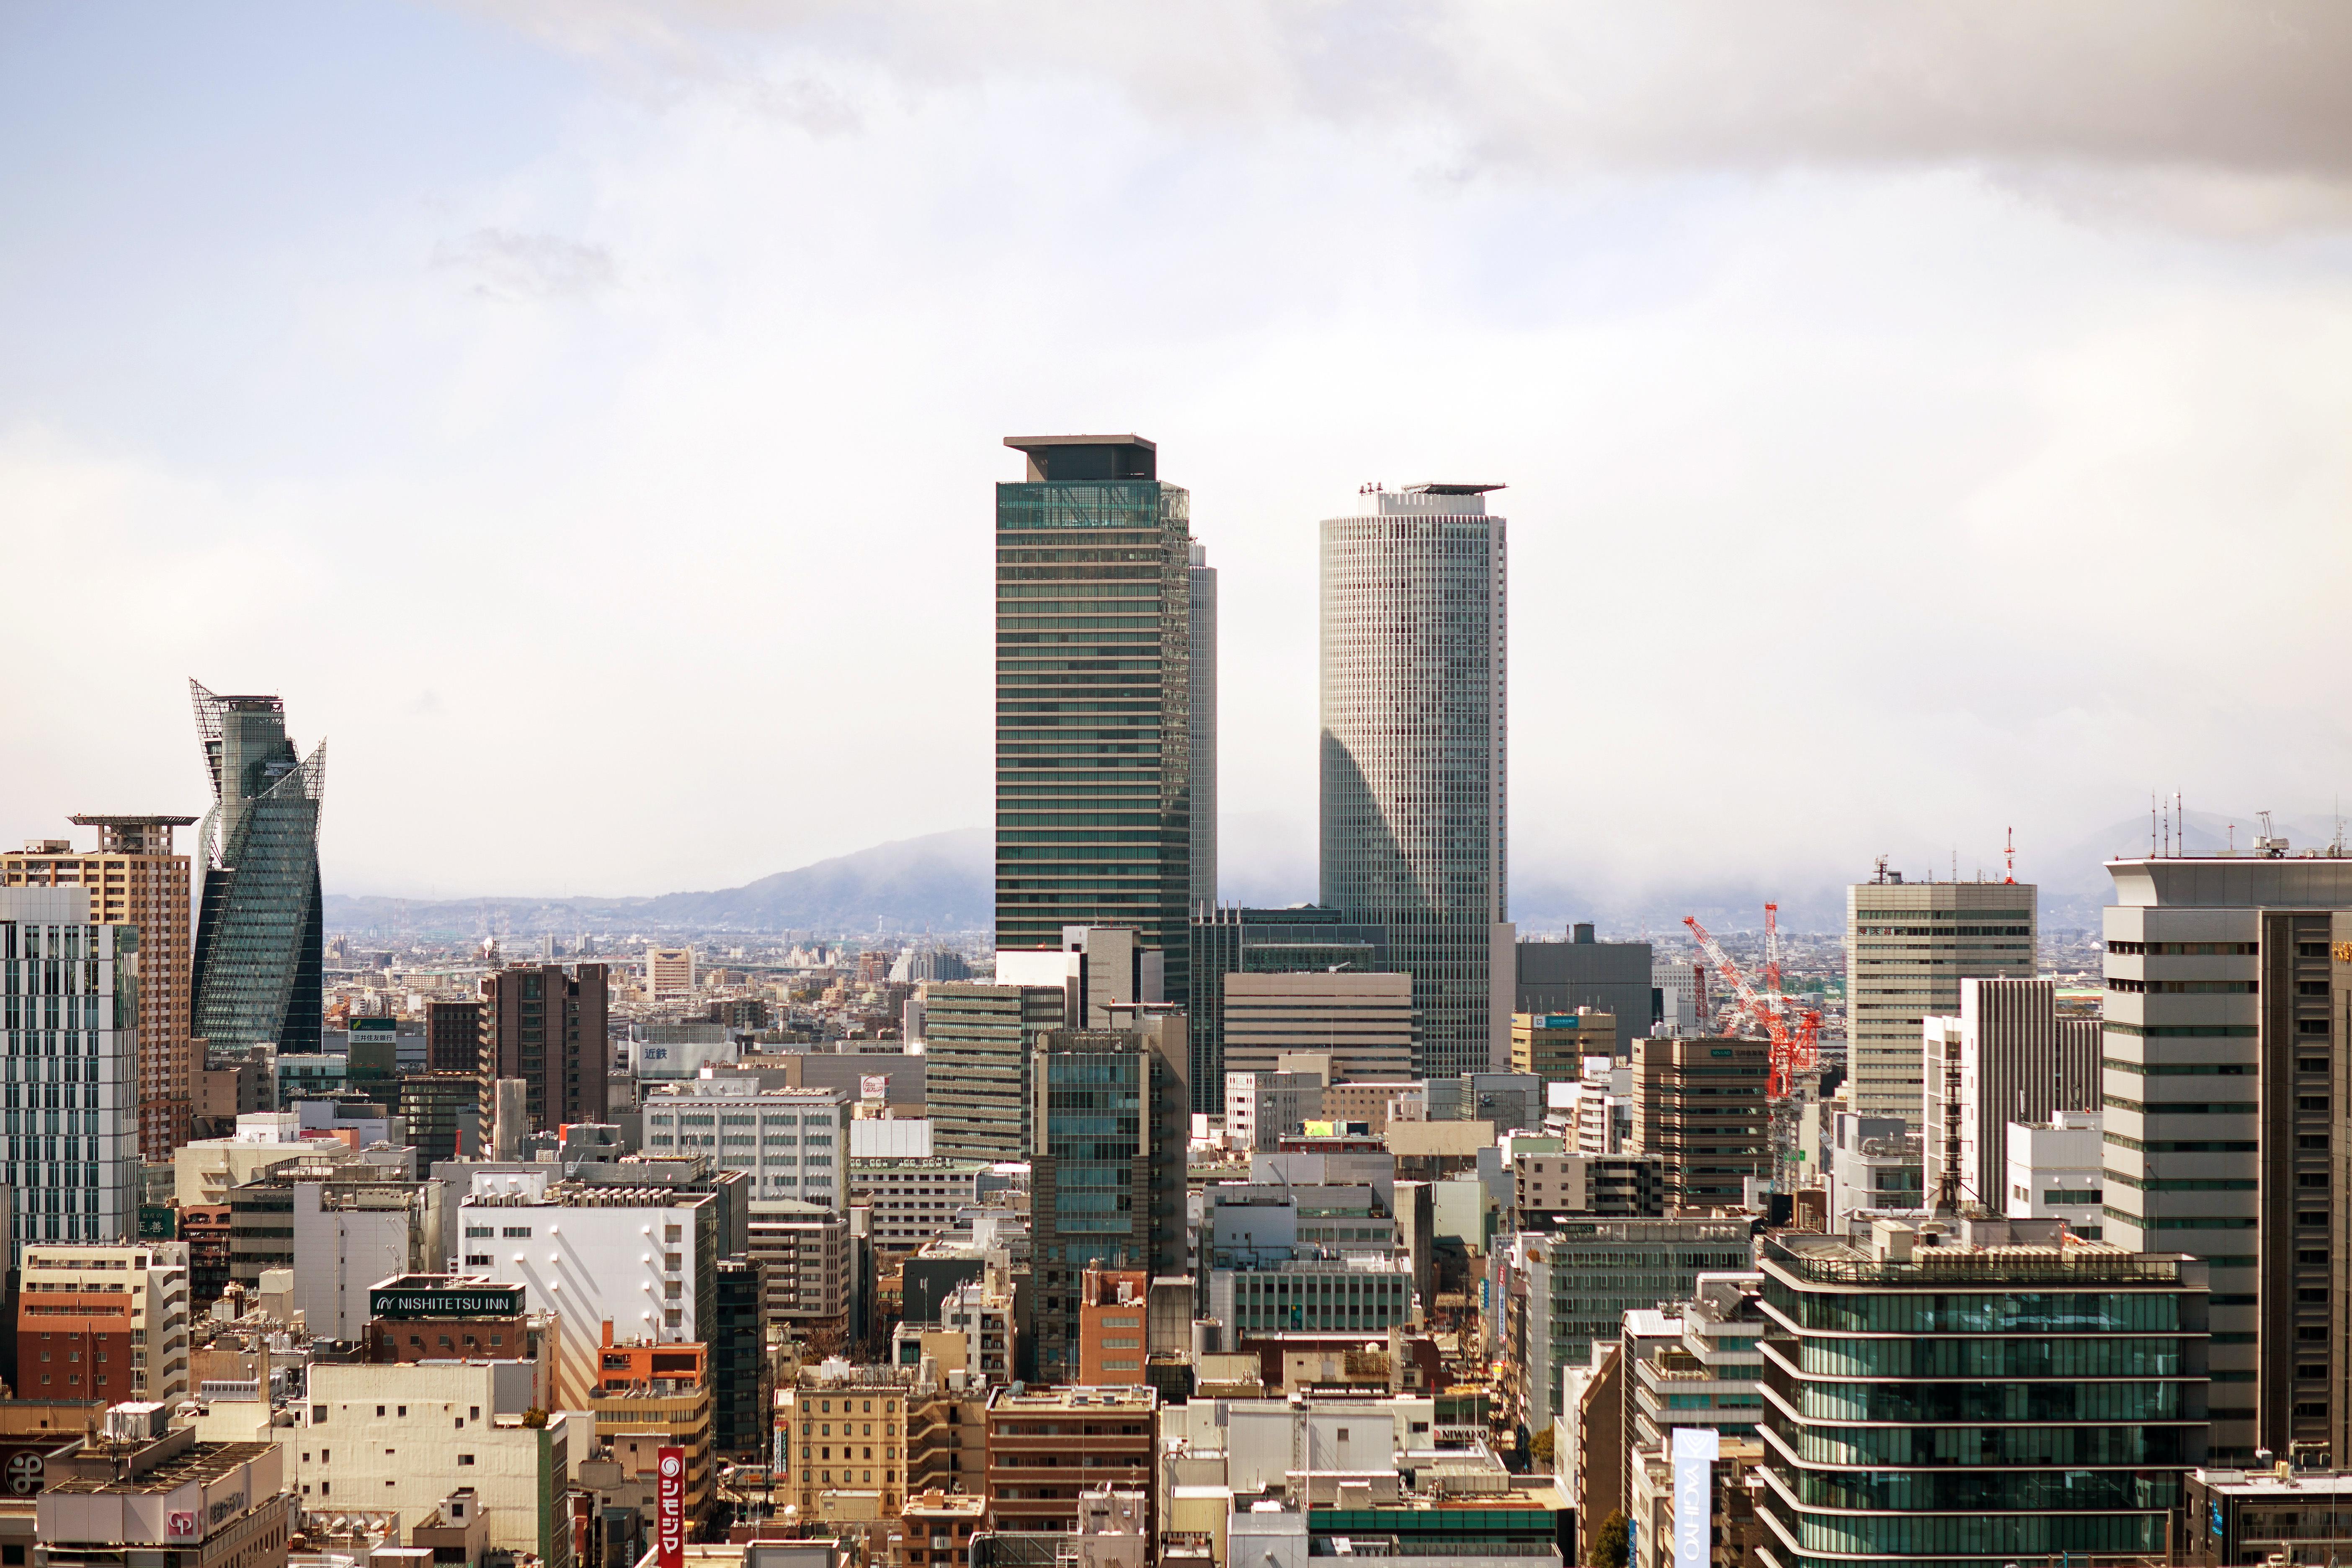 Nagoya's business district. GNIC